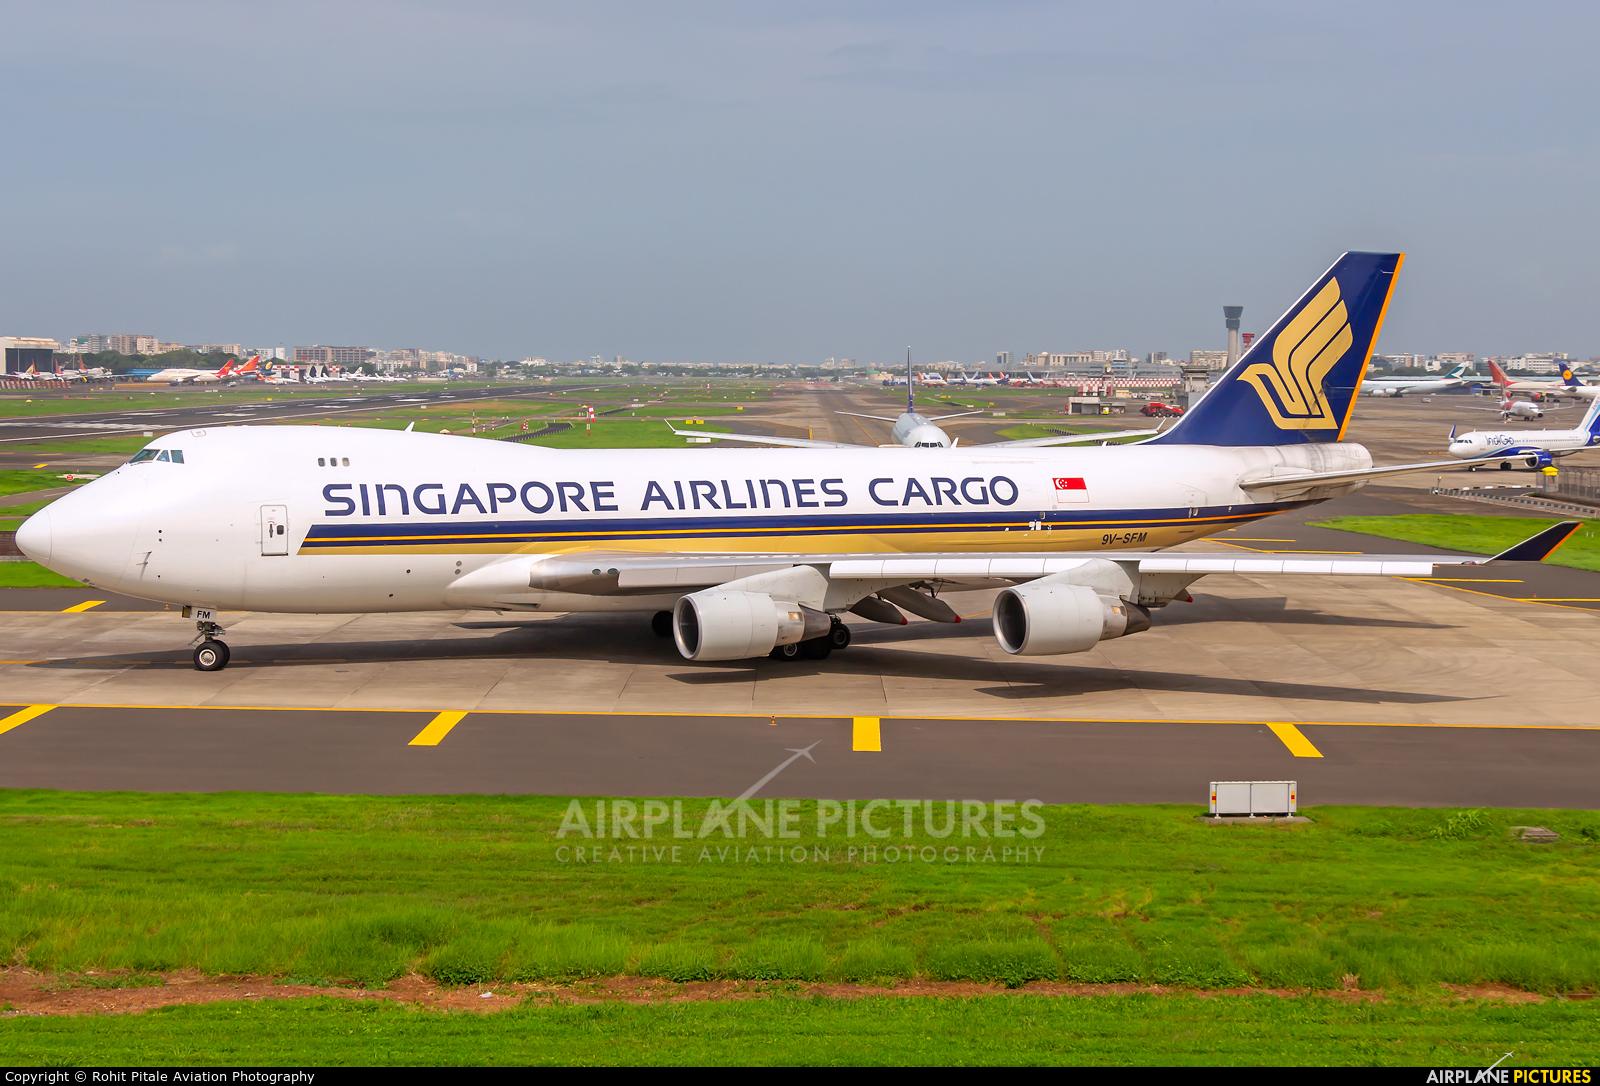 Singapore Airlines Cargo 9V-SFM aircraft at Mumbai - Chhatrapati Shivaji Intl